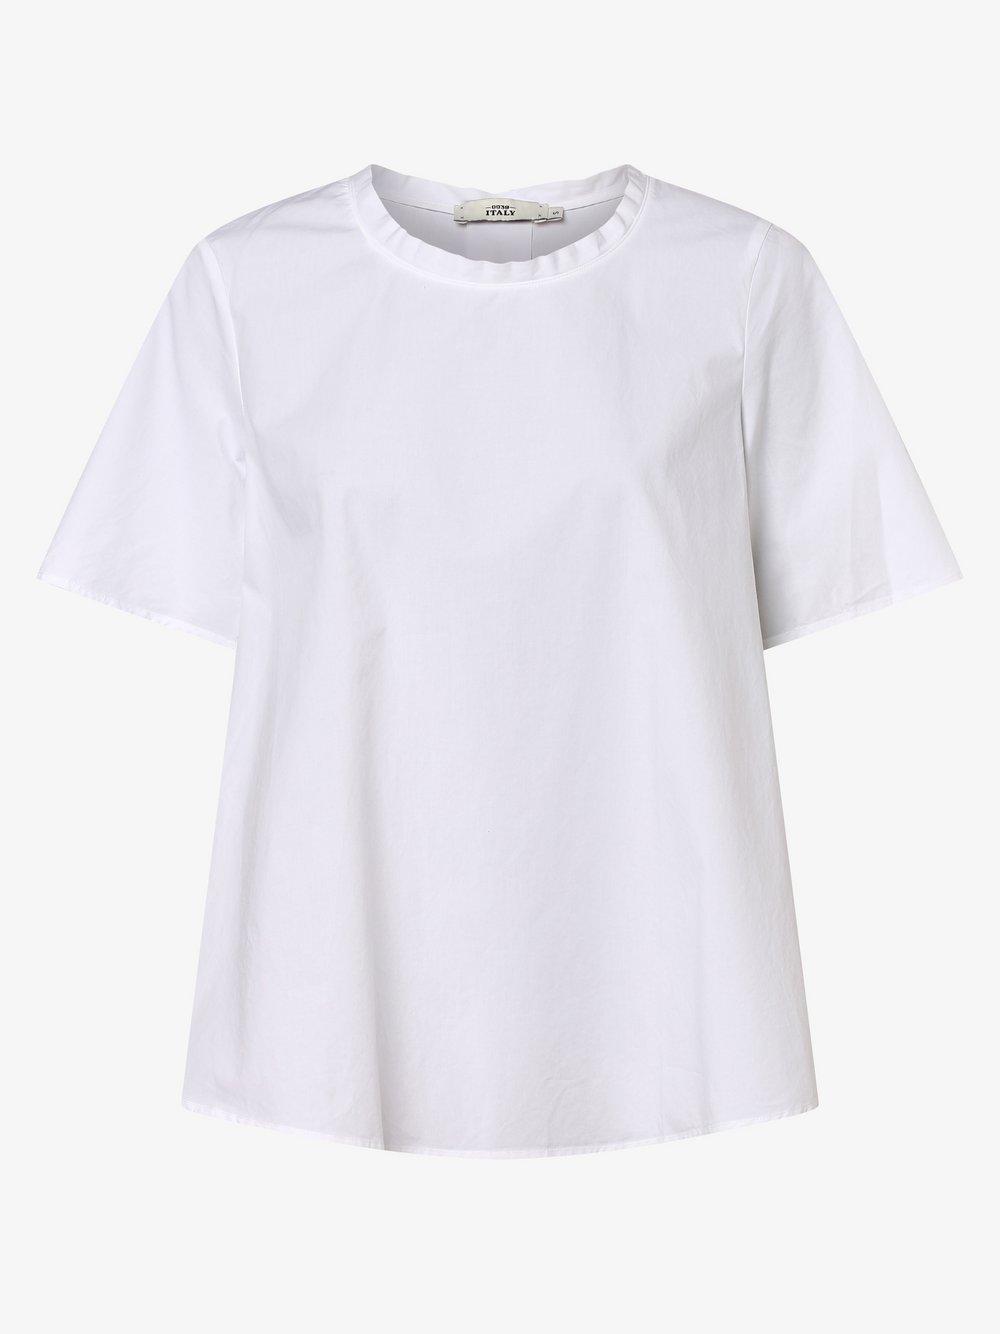 0039 Italy – Bluzka damska – Kippa, biały Van Graaf 464297-0001